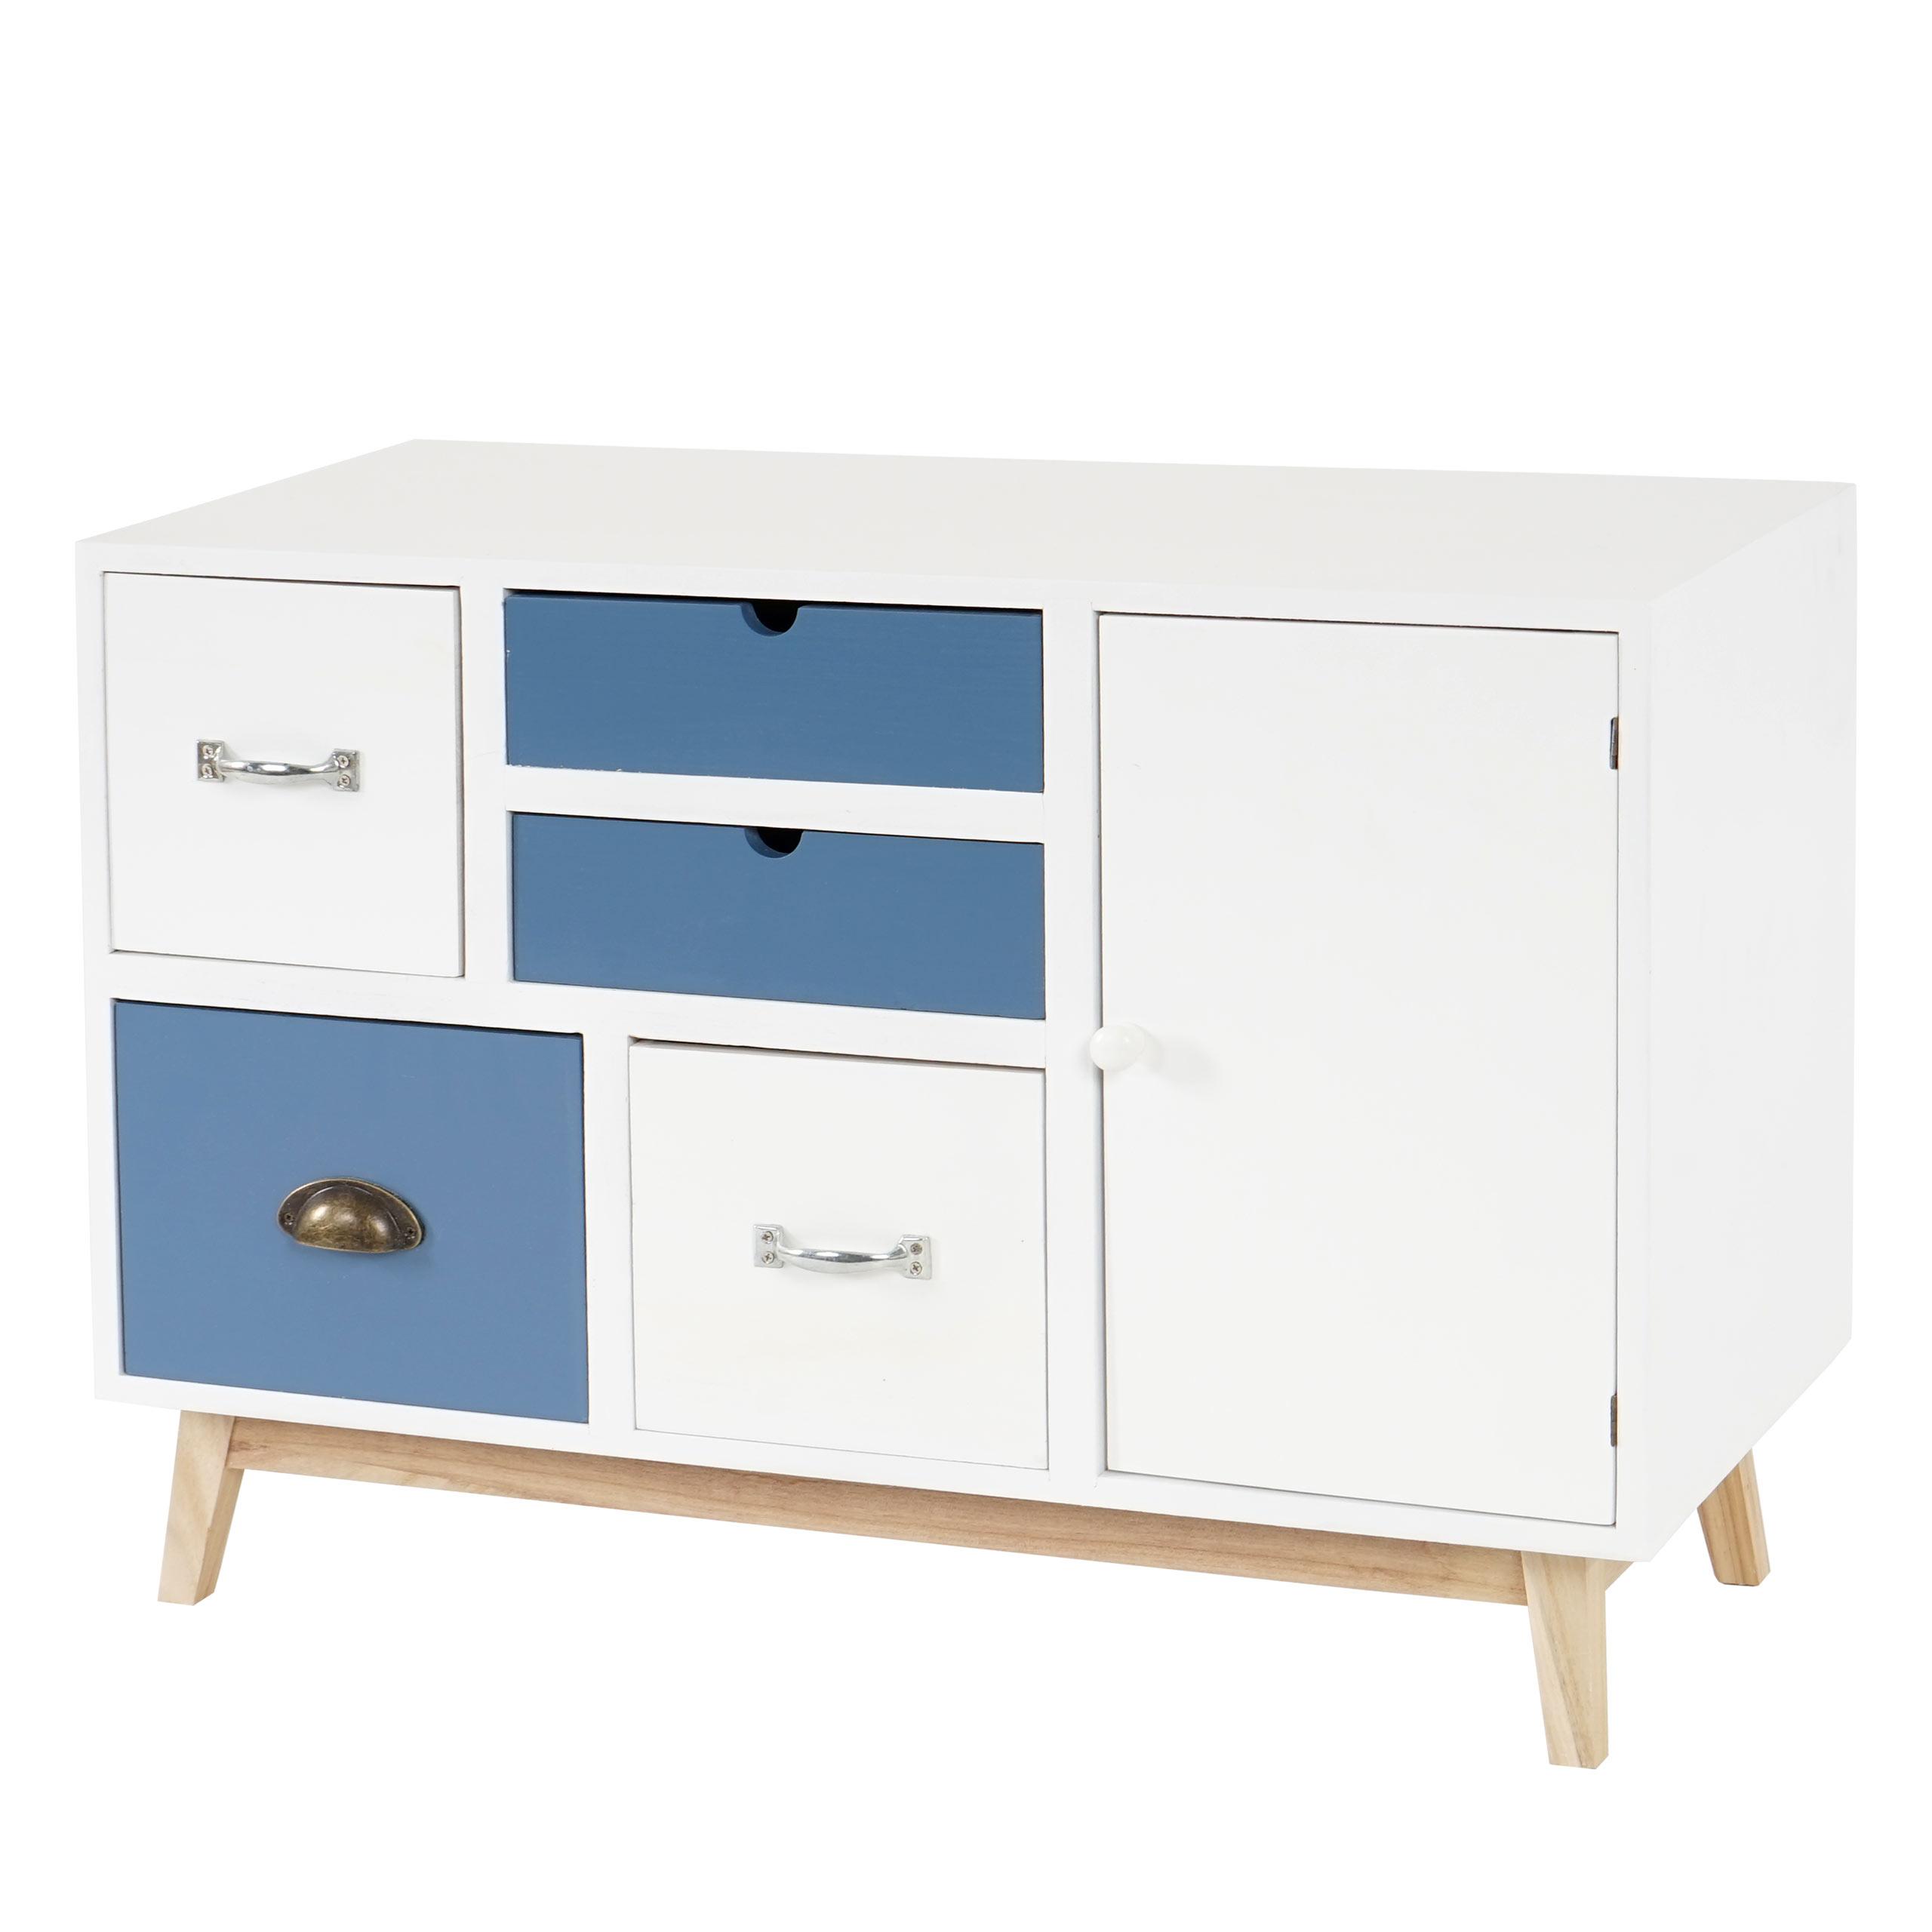 kommode vaasa t273 sideboard schrank patchwork retro design 58x81x34cm ebay. Black Bedroom Furniture Sets. Home Design Ideas